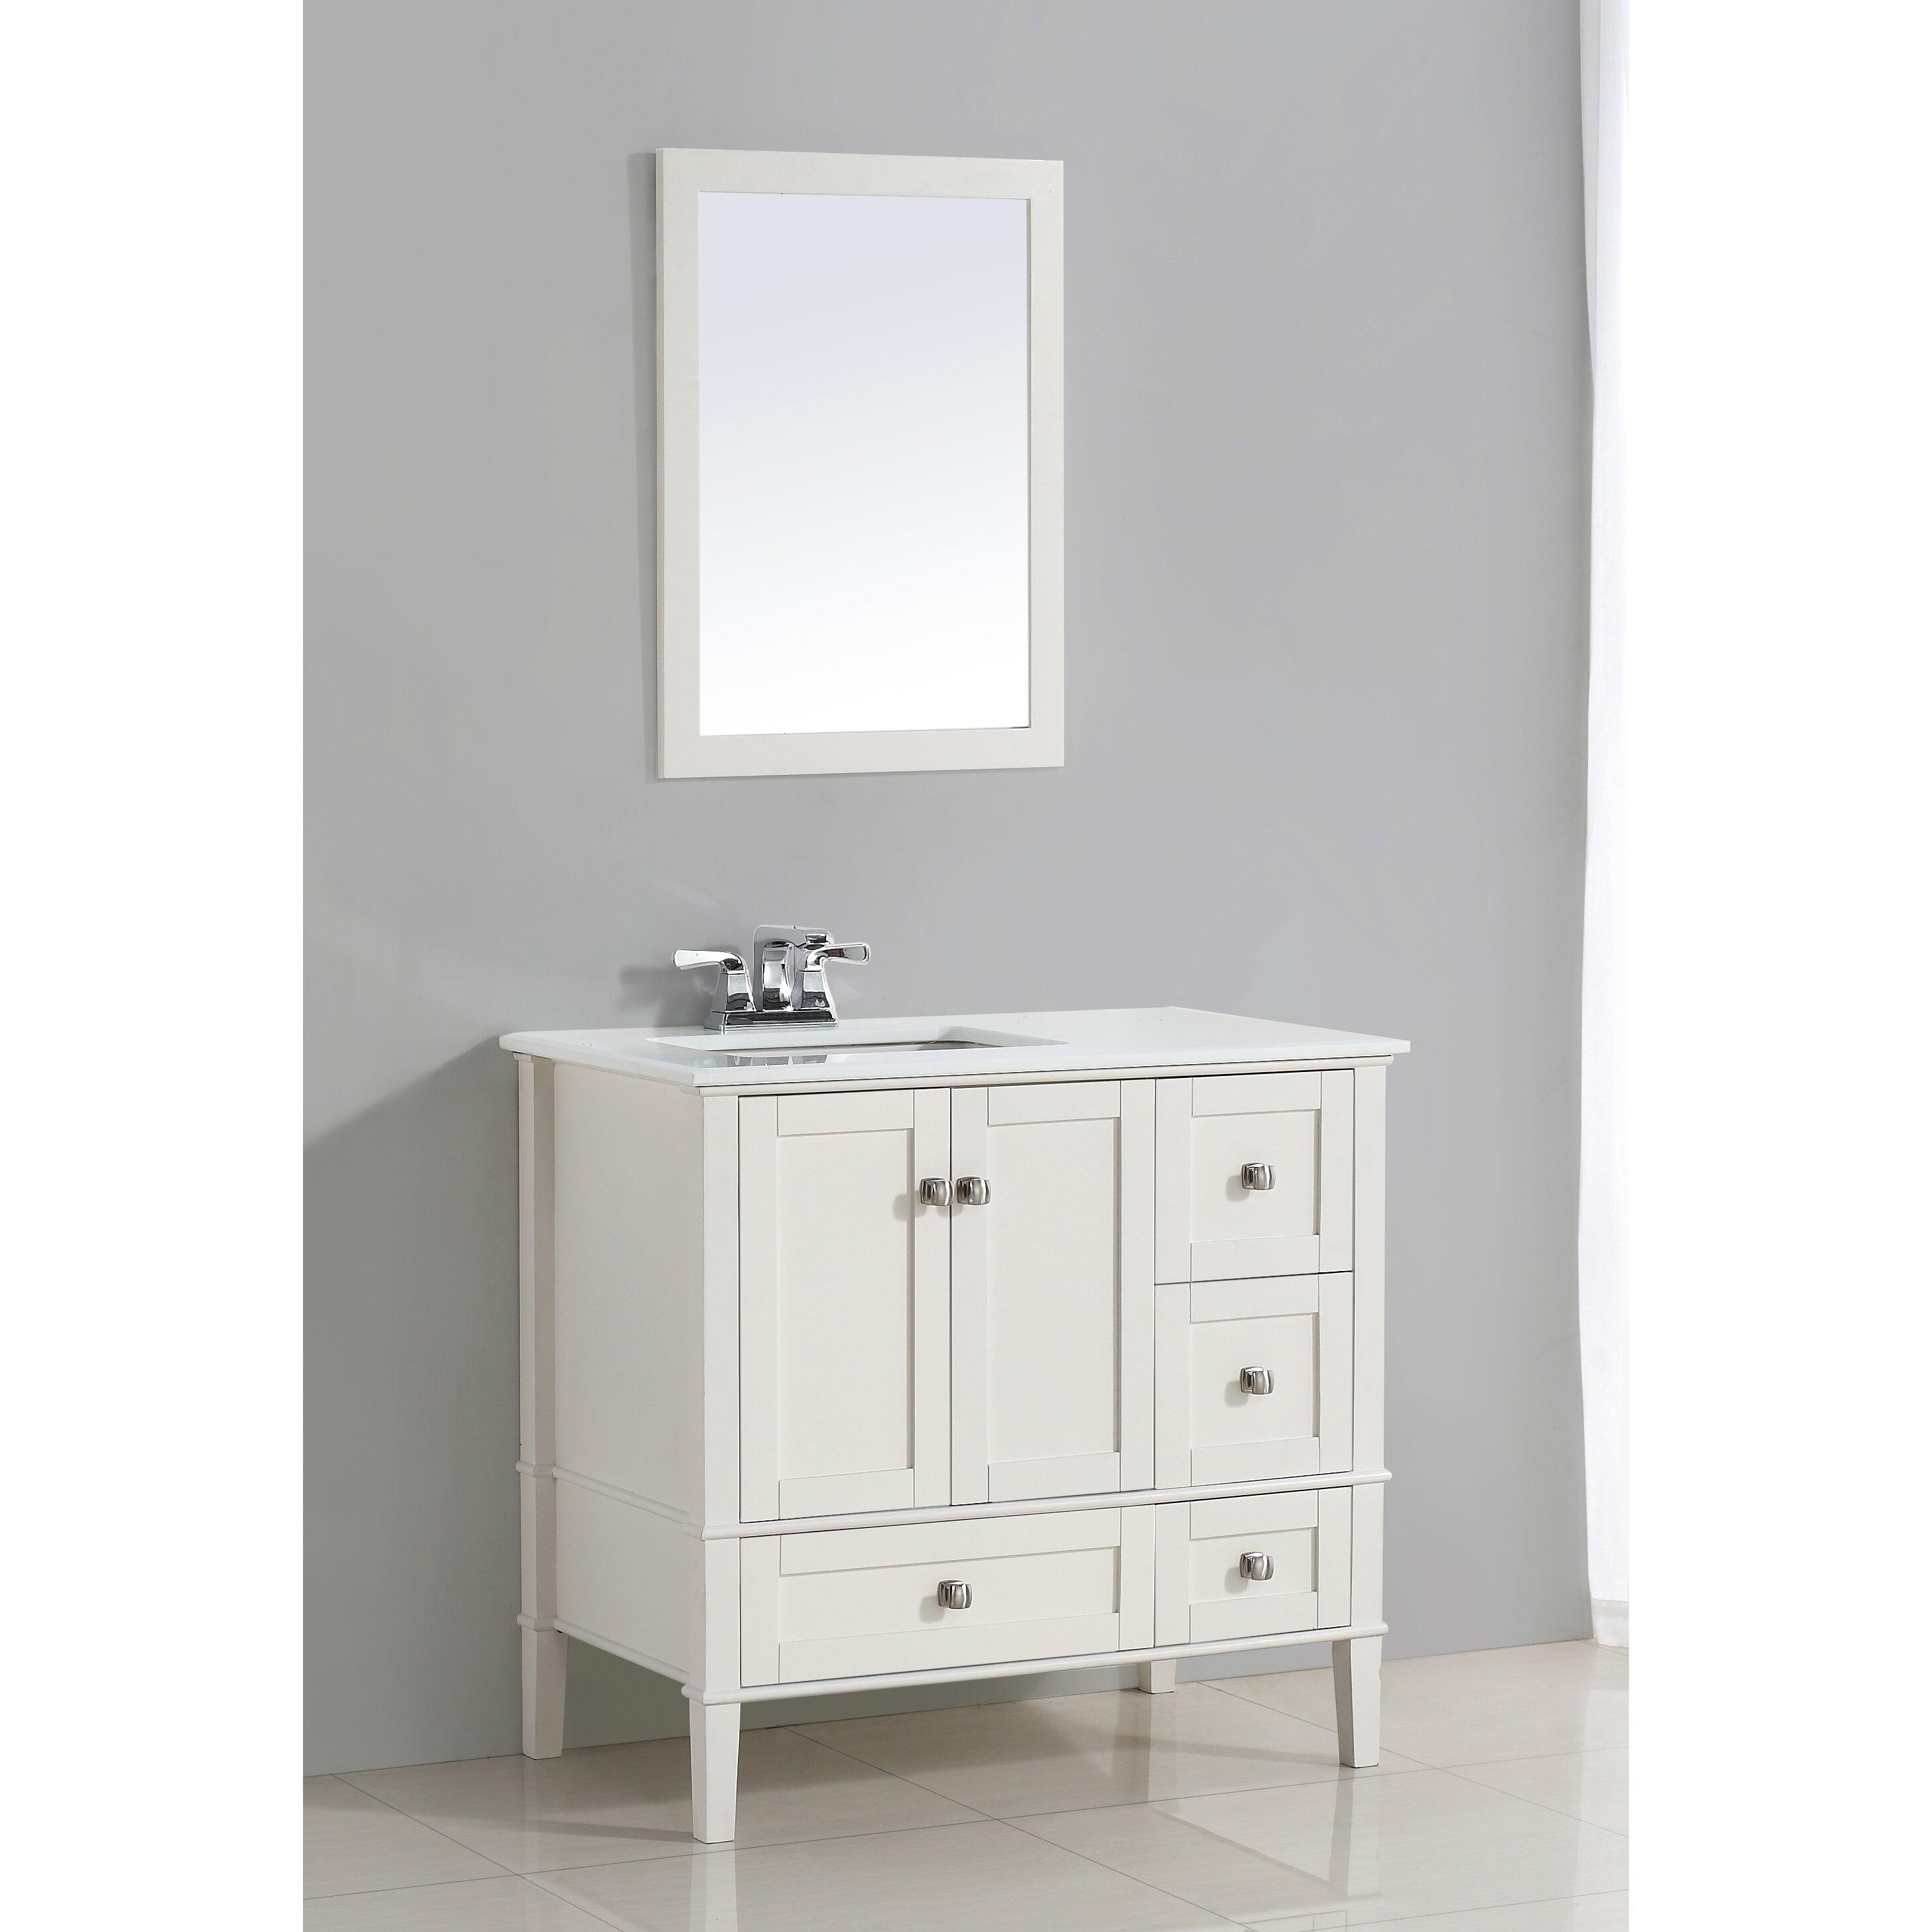 Simpli home chelsea 37 single left offset bath vanity set for Bathroom cabinets reviews